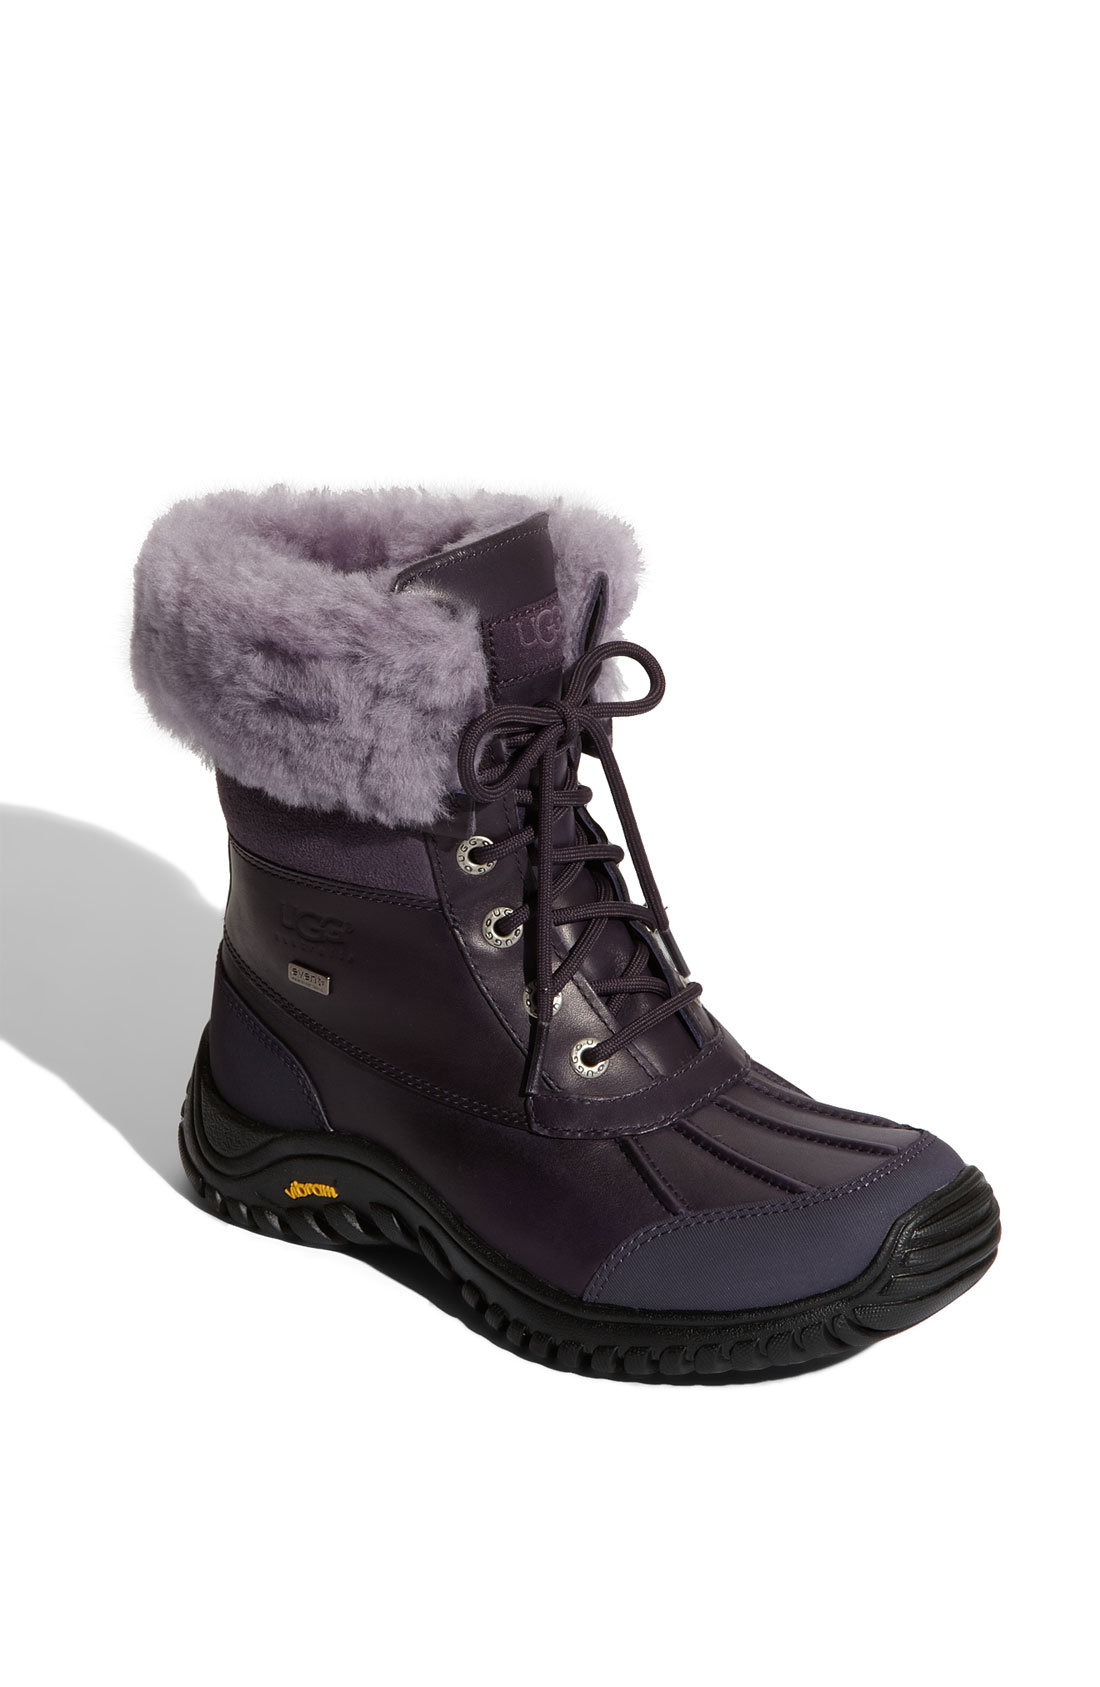 ugg australia boots nordstrom